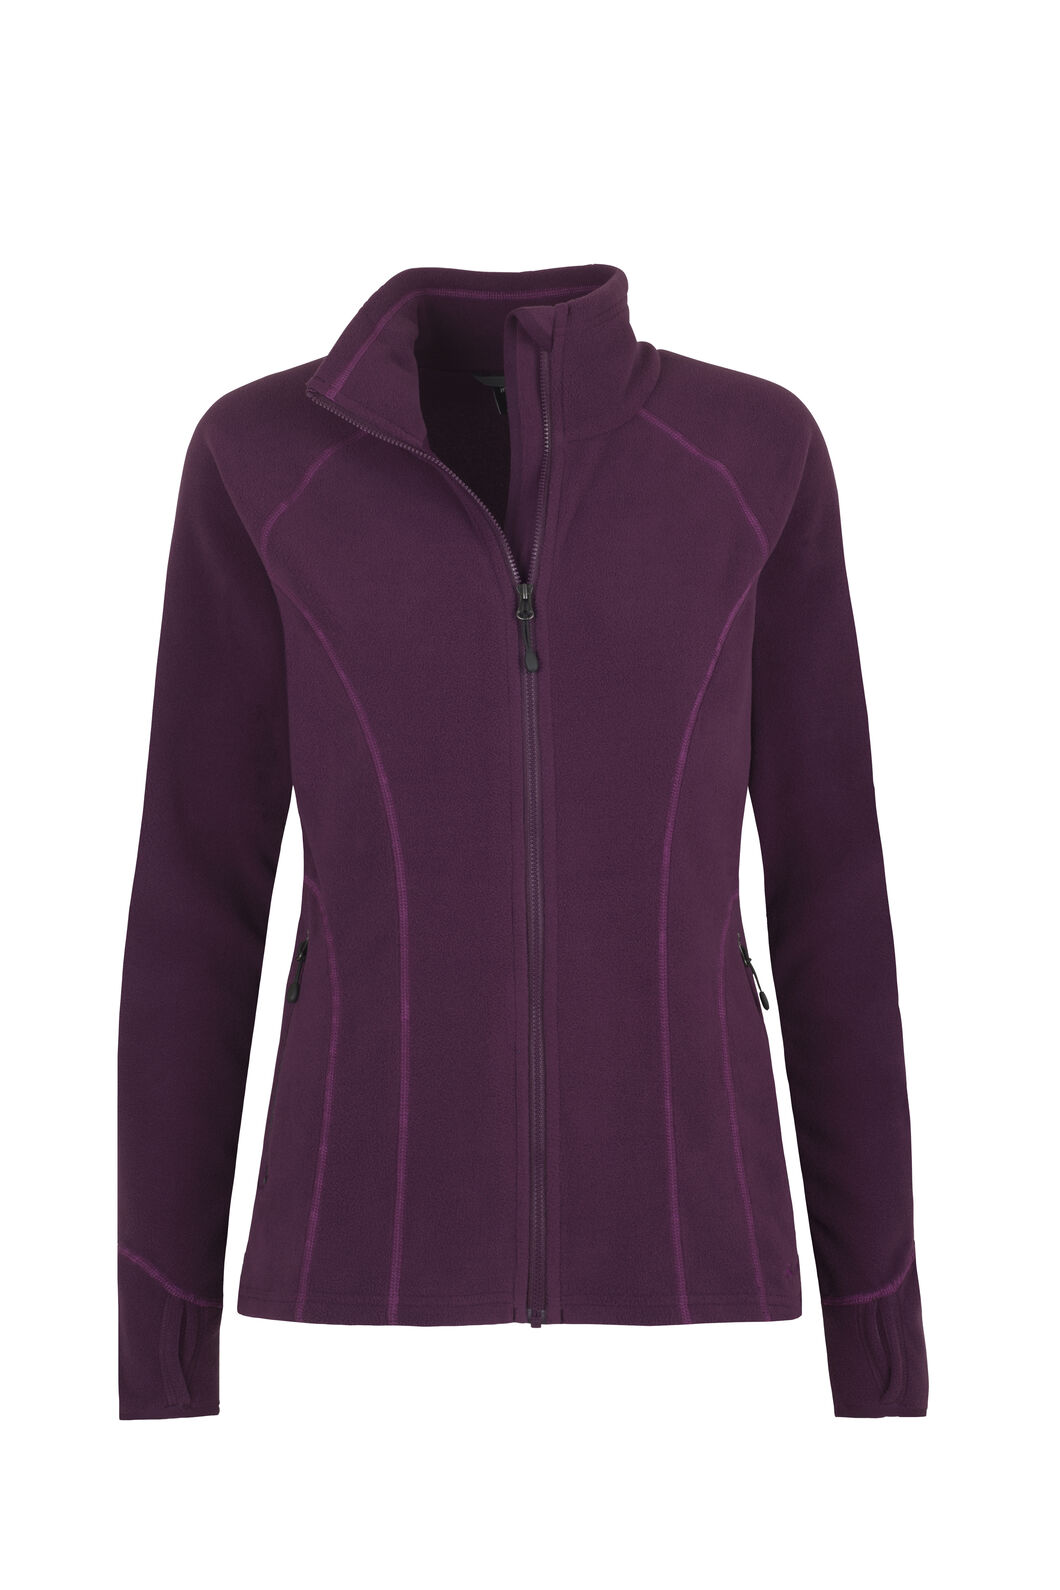 Macpac Kea Polartec® Micro Fleece® Jacket - Women's, Potent Purple, hi-res